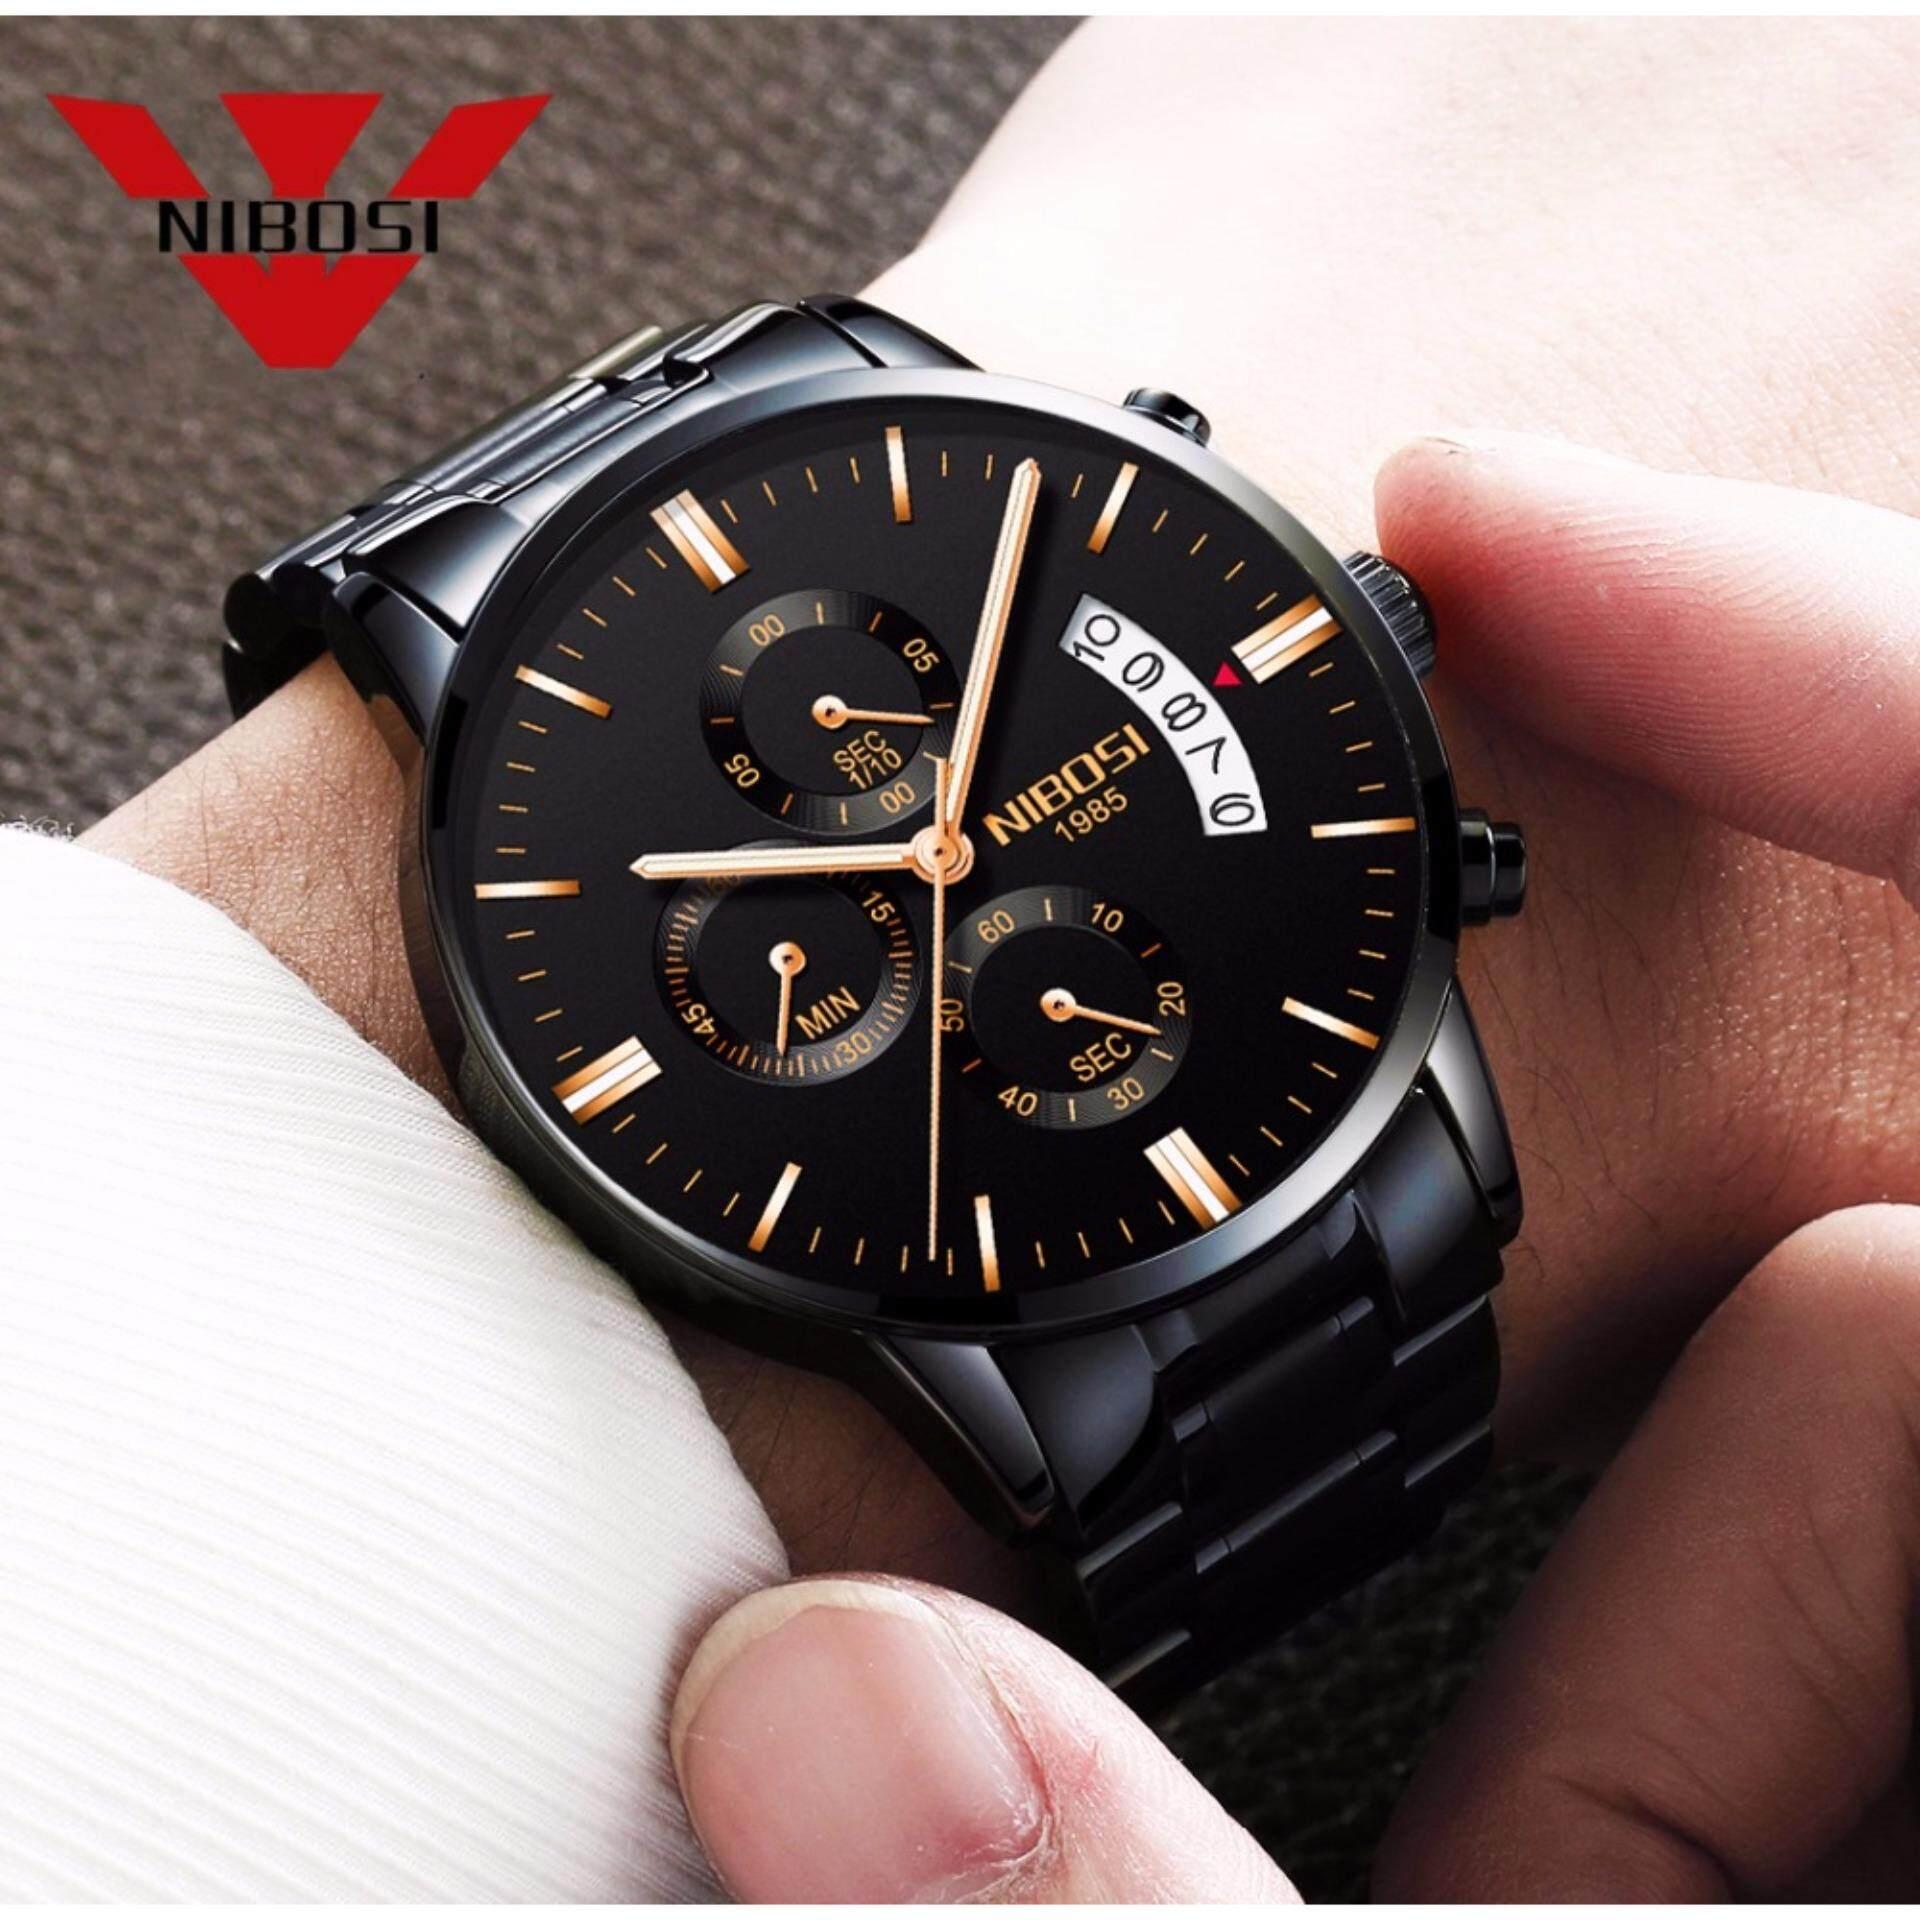 NIBOSI Relogio Masculino Men Watches Luxury Famous Top Brand Men's Fashion Casual Dress Watch Military Quartz Wristwatches Saat 2309 - intl